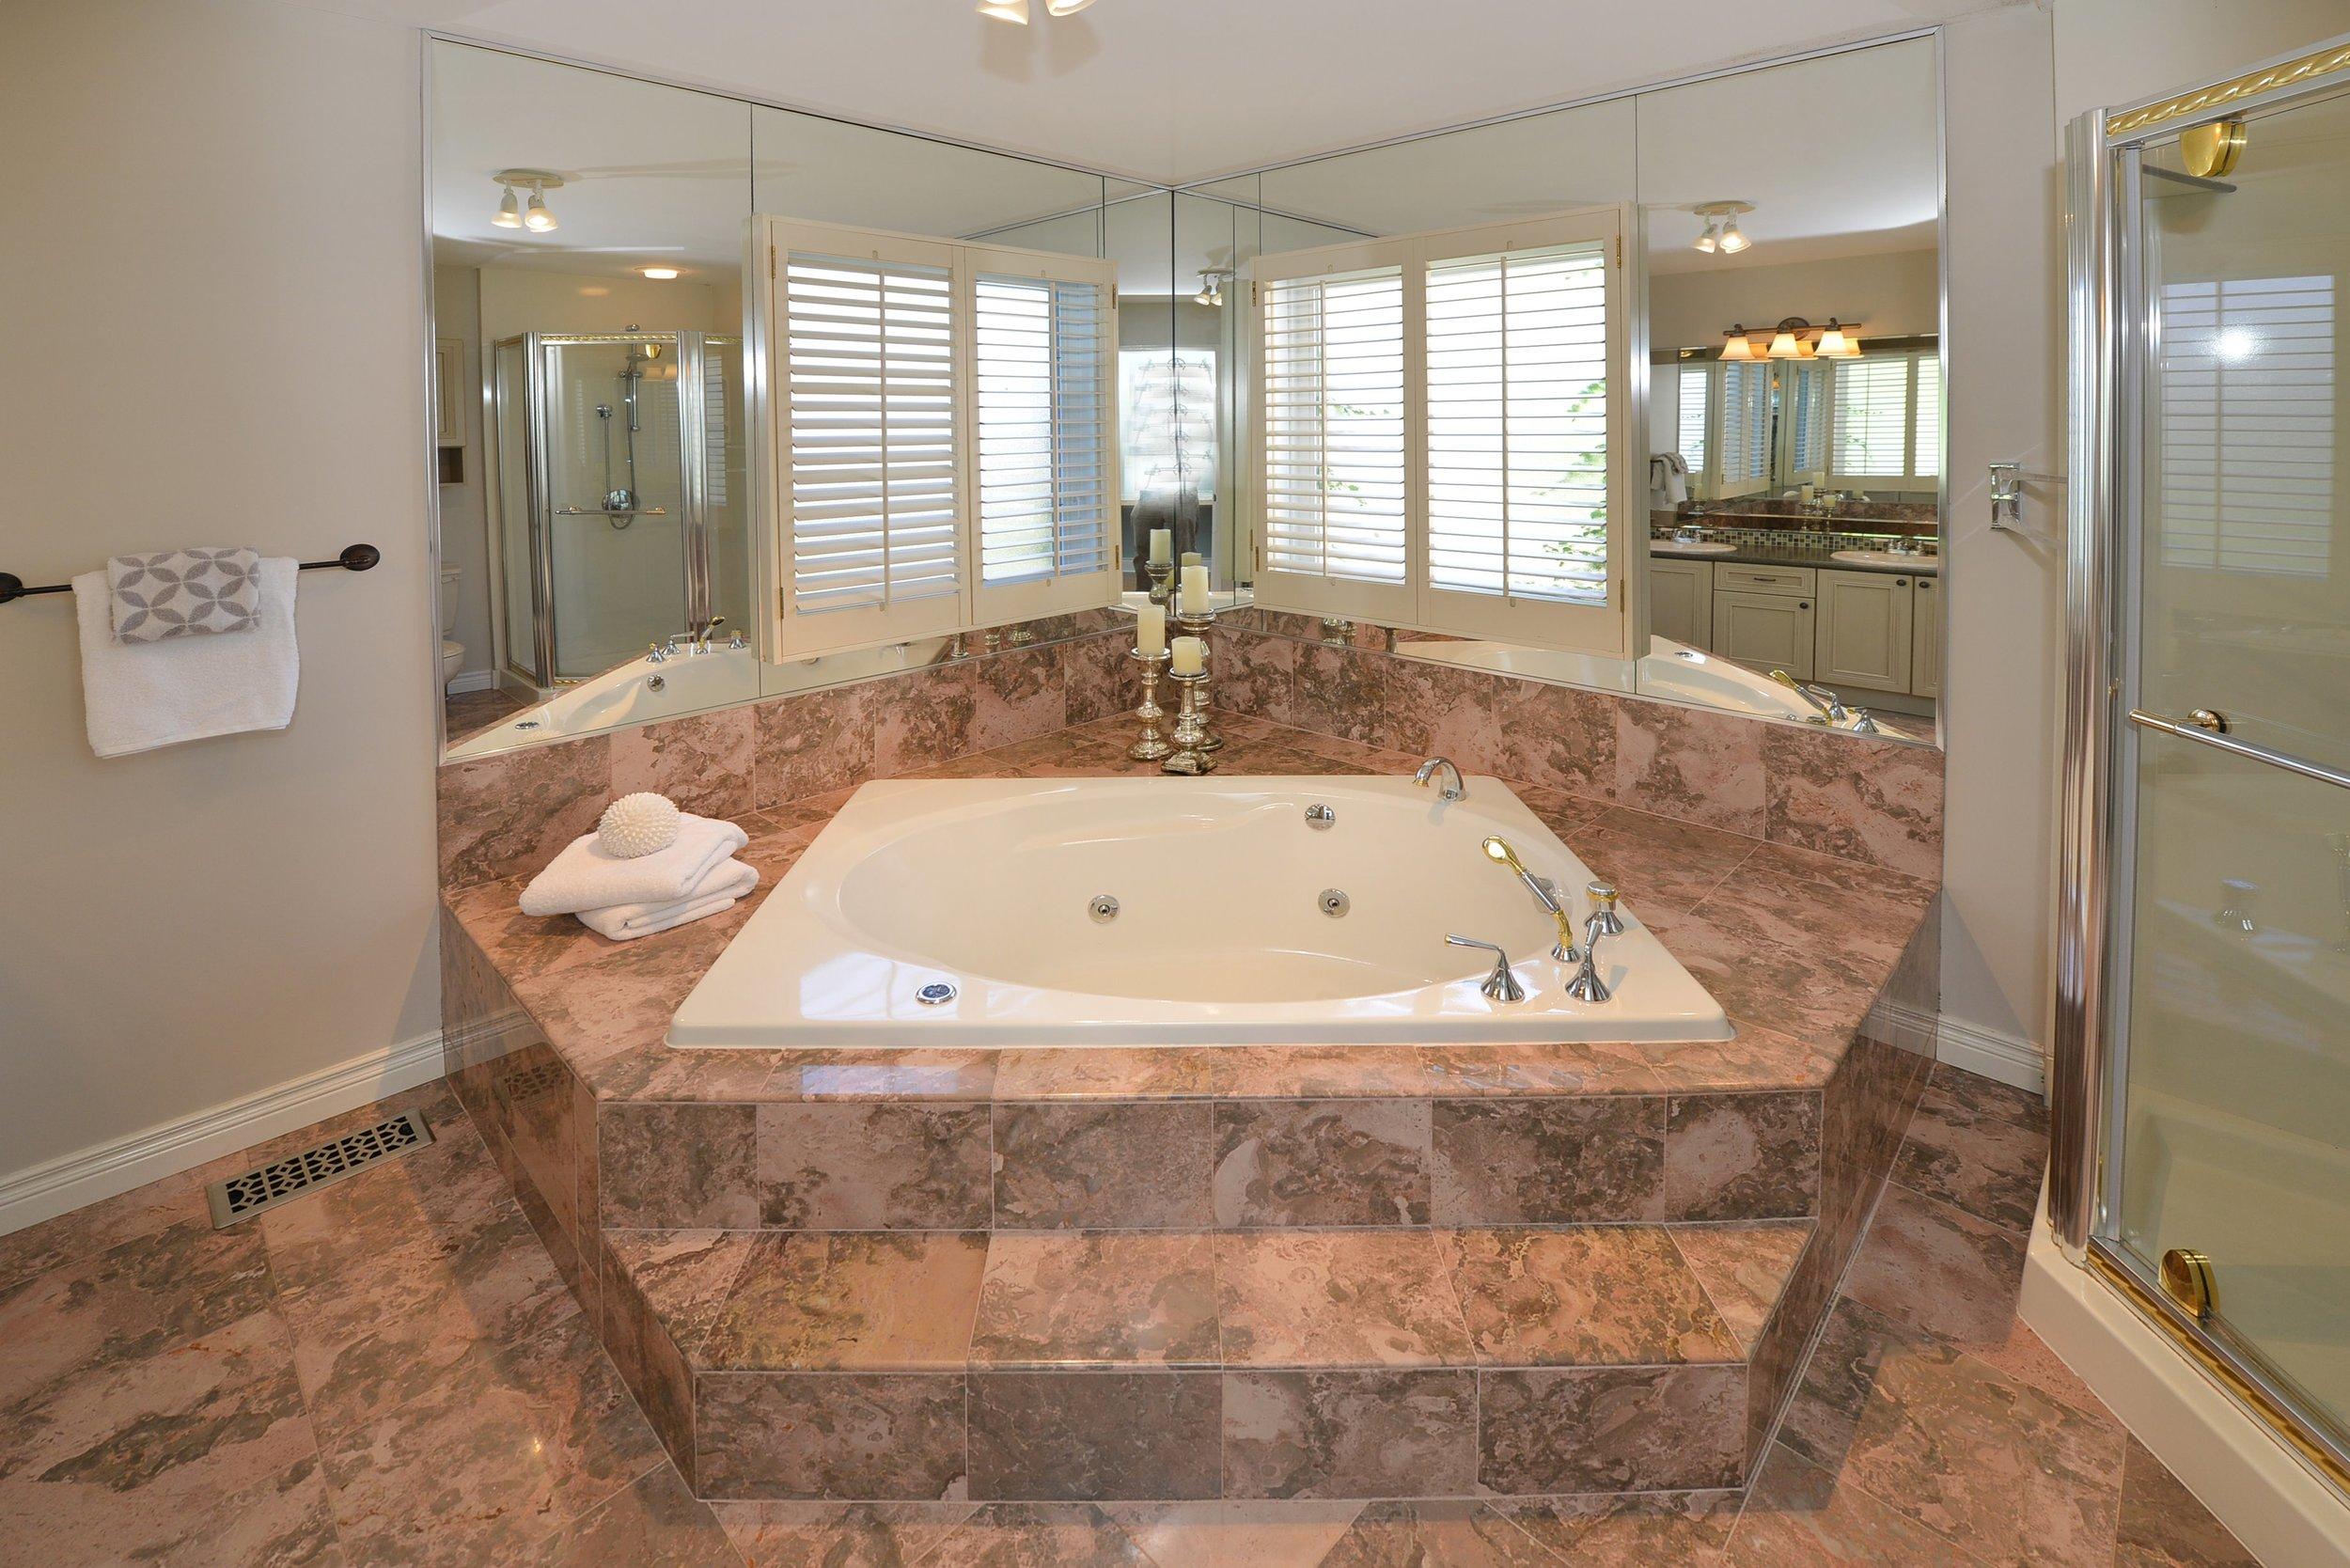 2767_guilford_crescent_MLS30538562_HID1121270_ROOMmasterbathroom.jpg